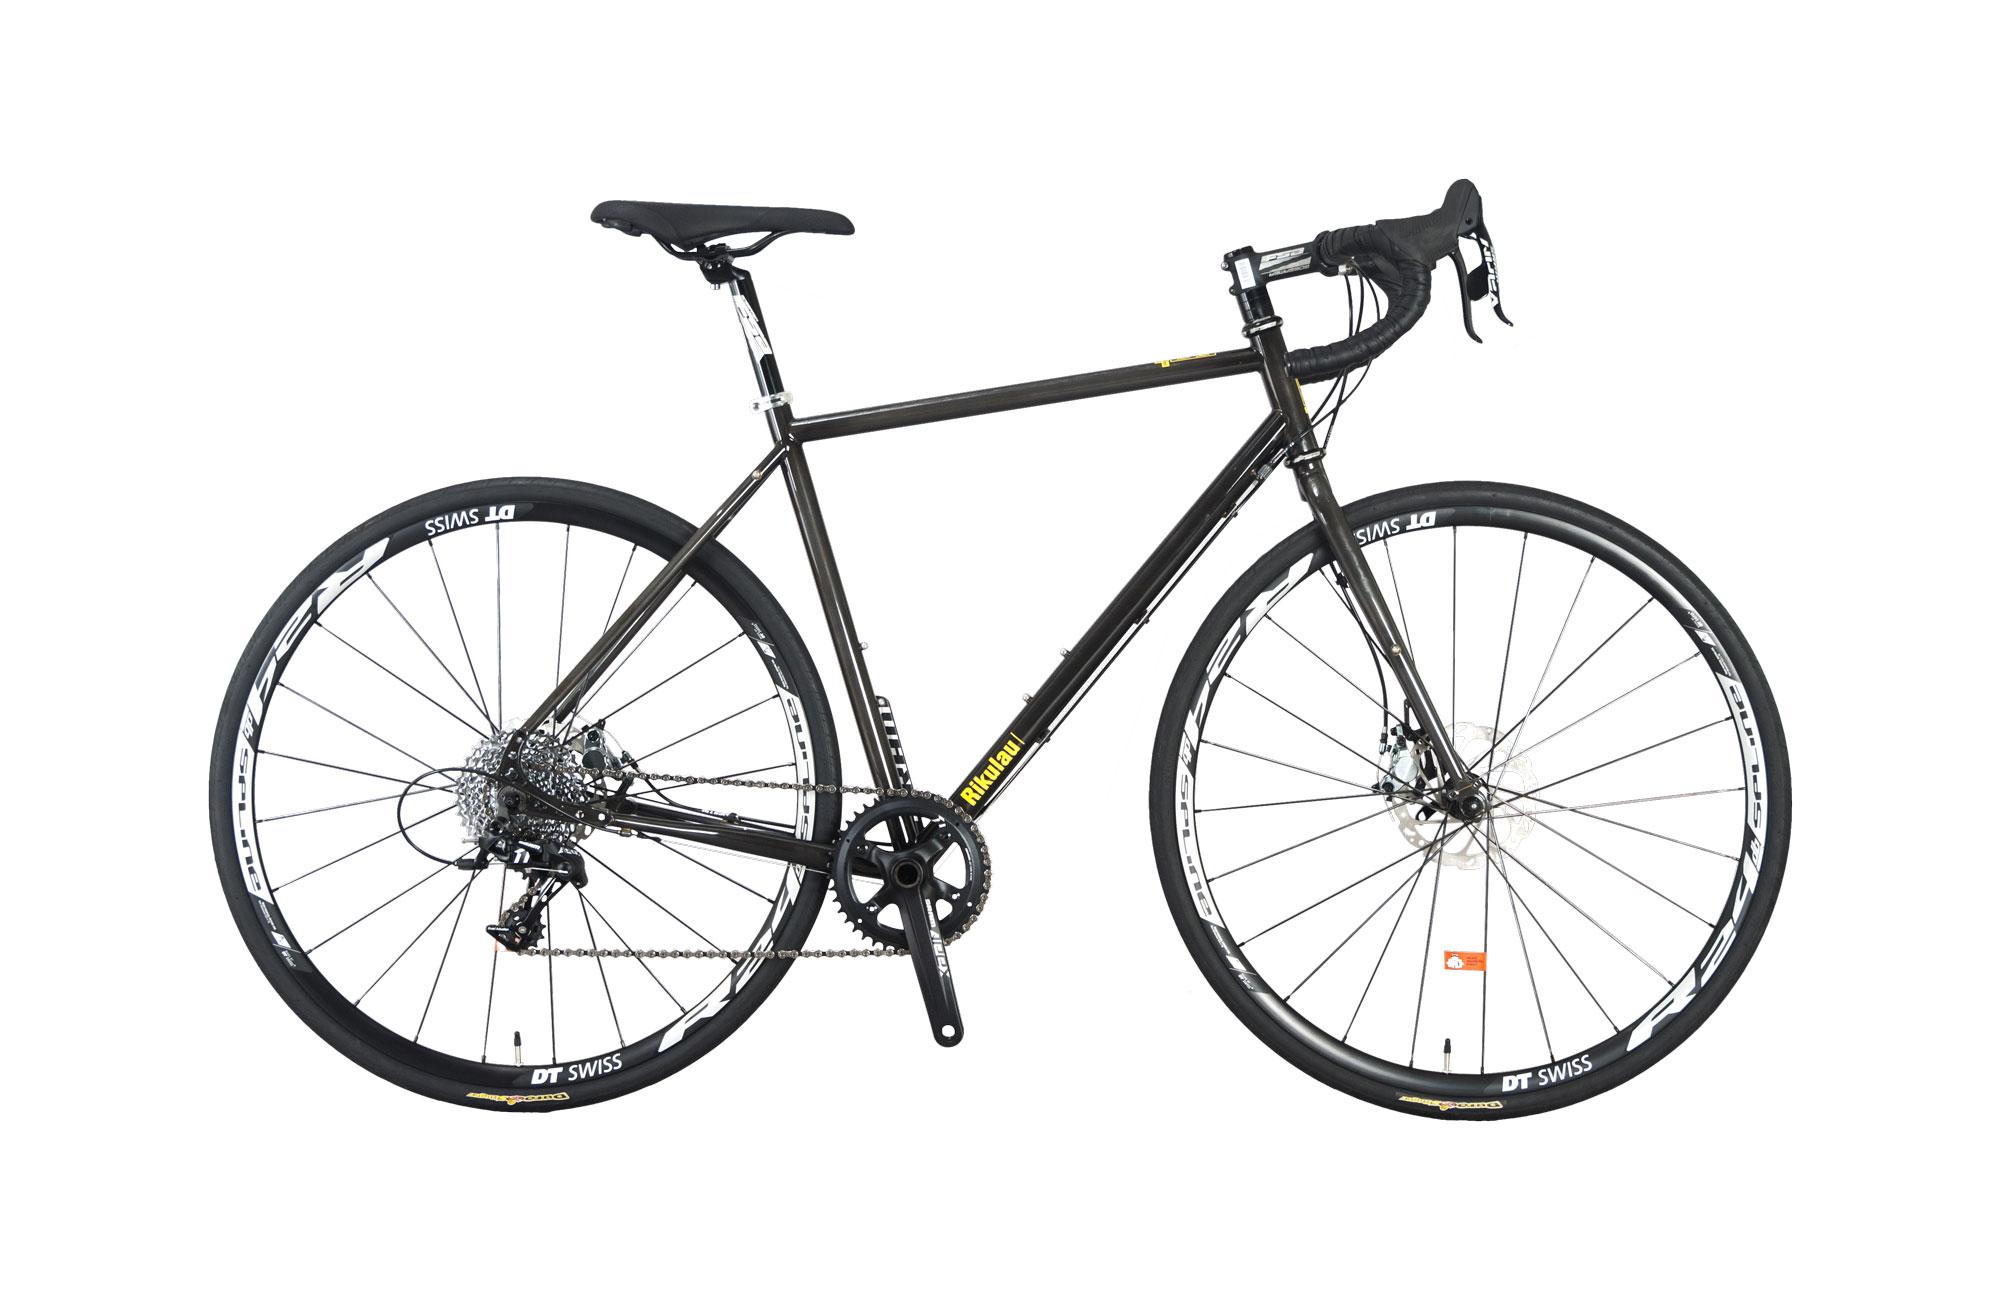 Gravel Bike - Ili Ili Hercules (chromoly)